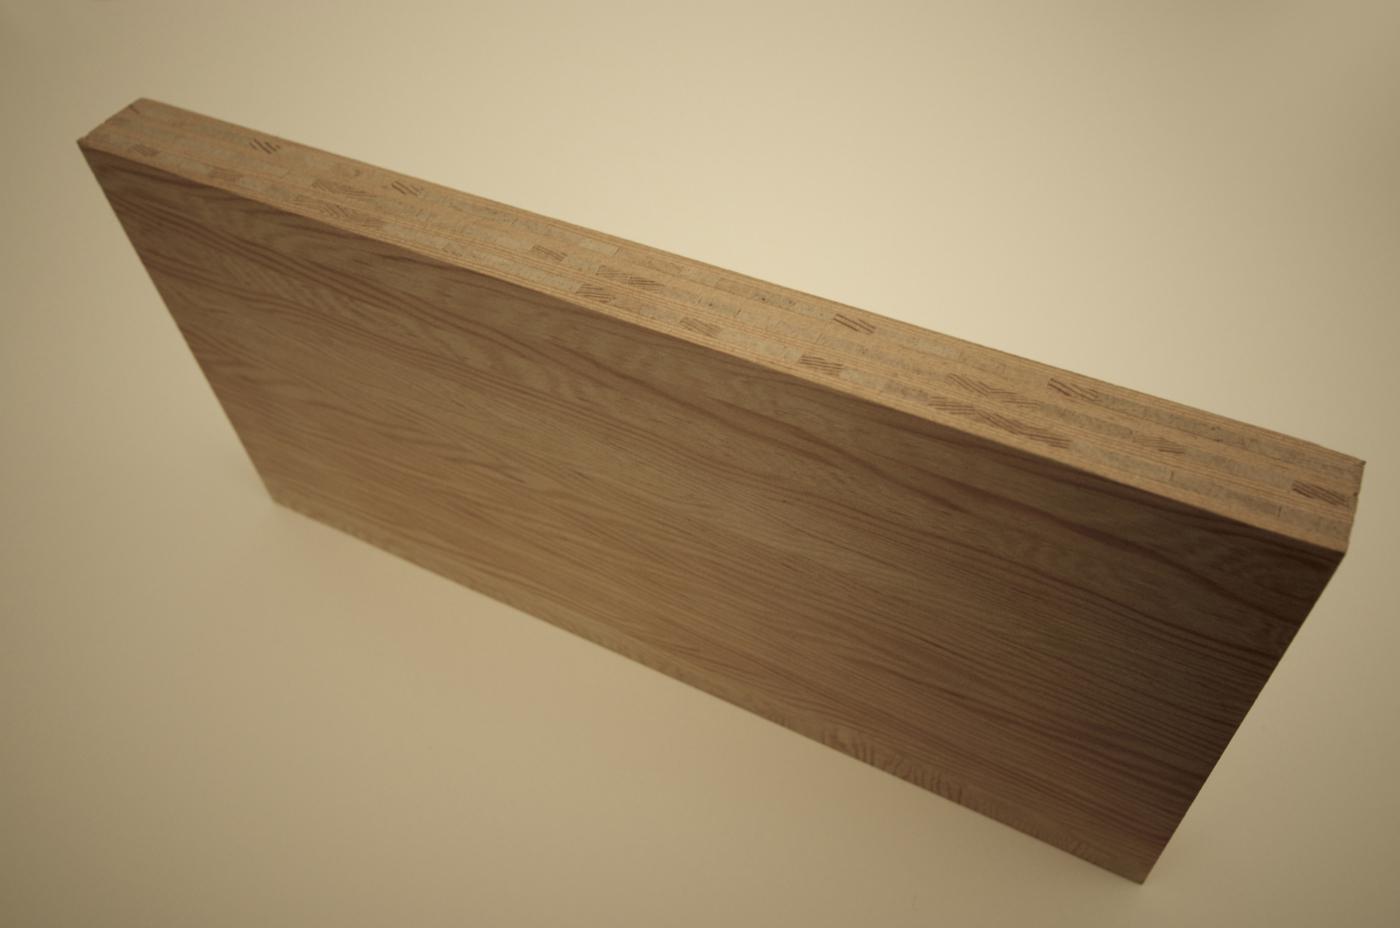 clt-timber-skin_1